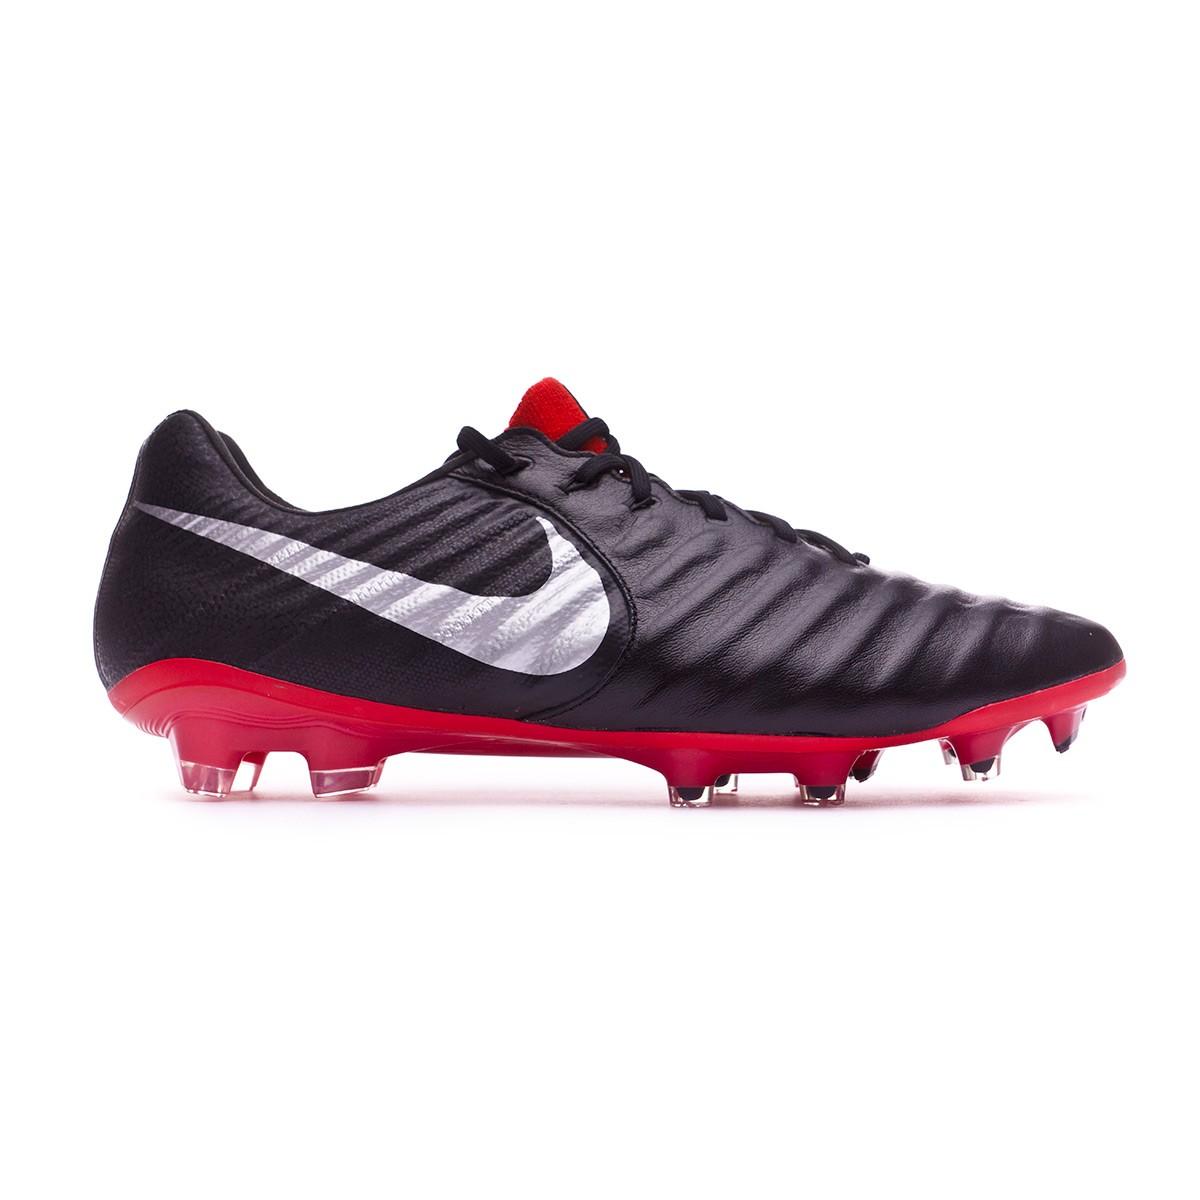 dd10ad6b0 Football Boots Nike Tiempo Legend VII Elite FG Black-Metallic silver-Light  crimson - Tienda de fútbol Fútbol Emotion